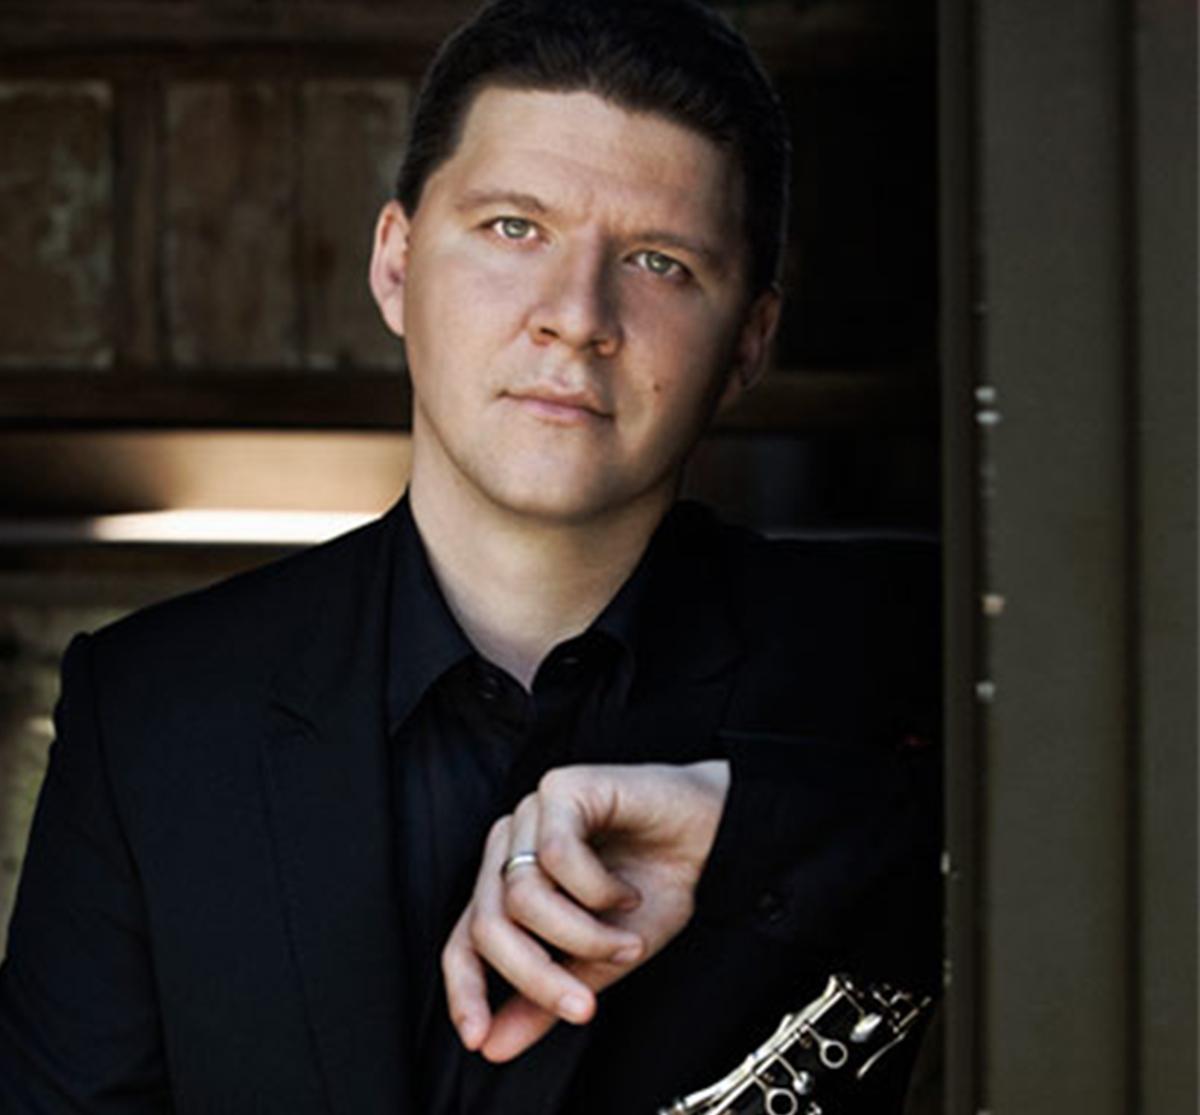 Alexander Fiterstein - Clarinetist, Faculty at Peabody Conservatory